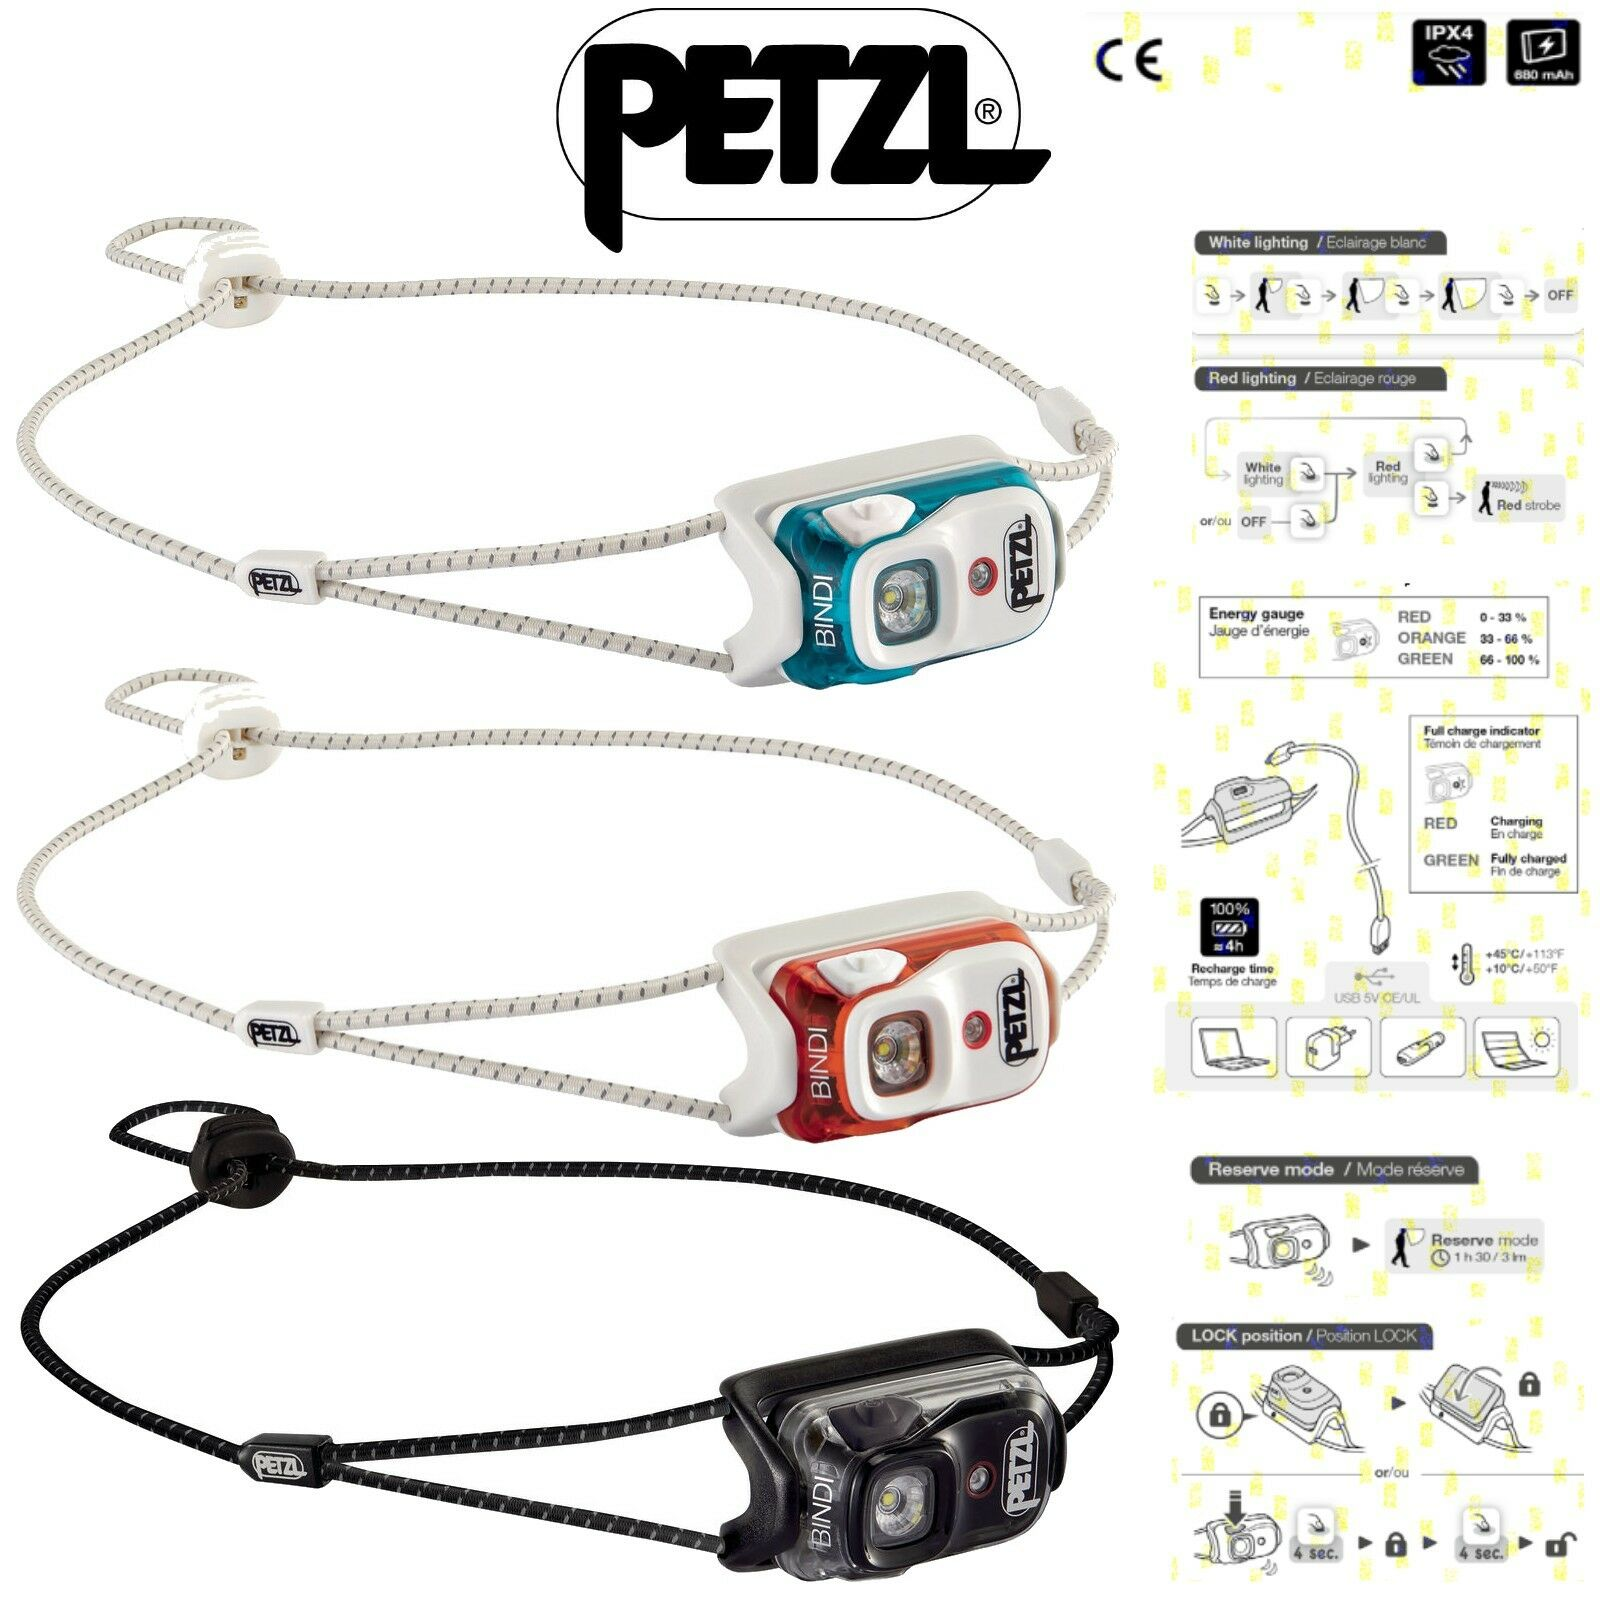 PETZL BINDI Lampada Frontale Ricaricabile USB Leggera 35gr da Running Torcia